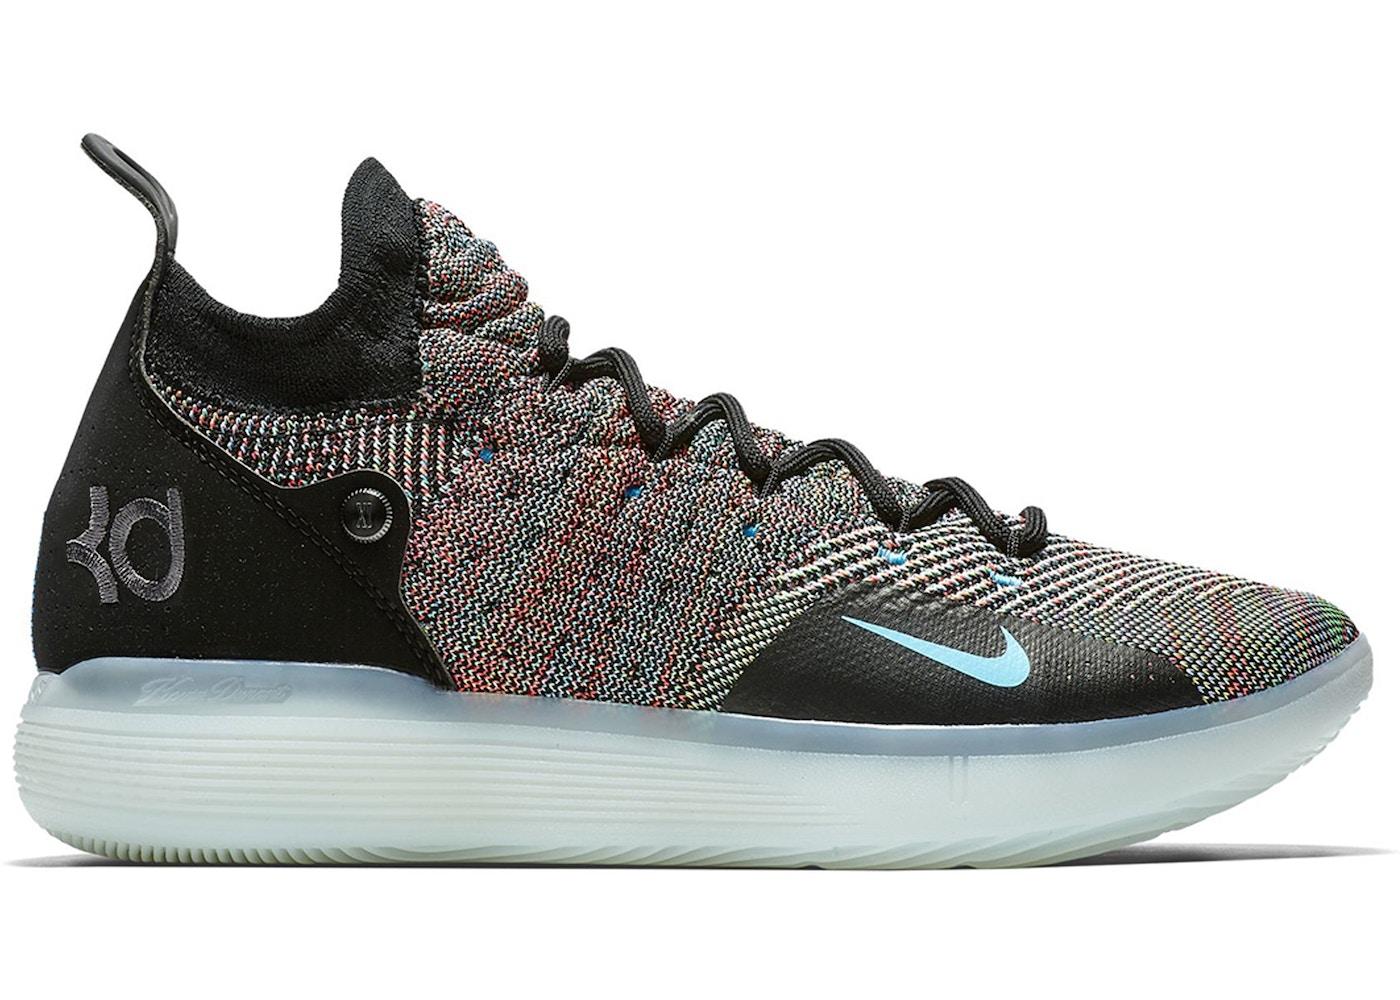 Predecir Mona Lisa índice  Nike KD 11 Multi-Color - AO2604-001/AO2605-001